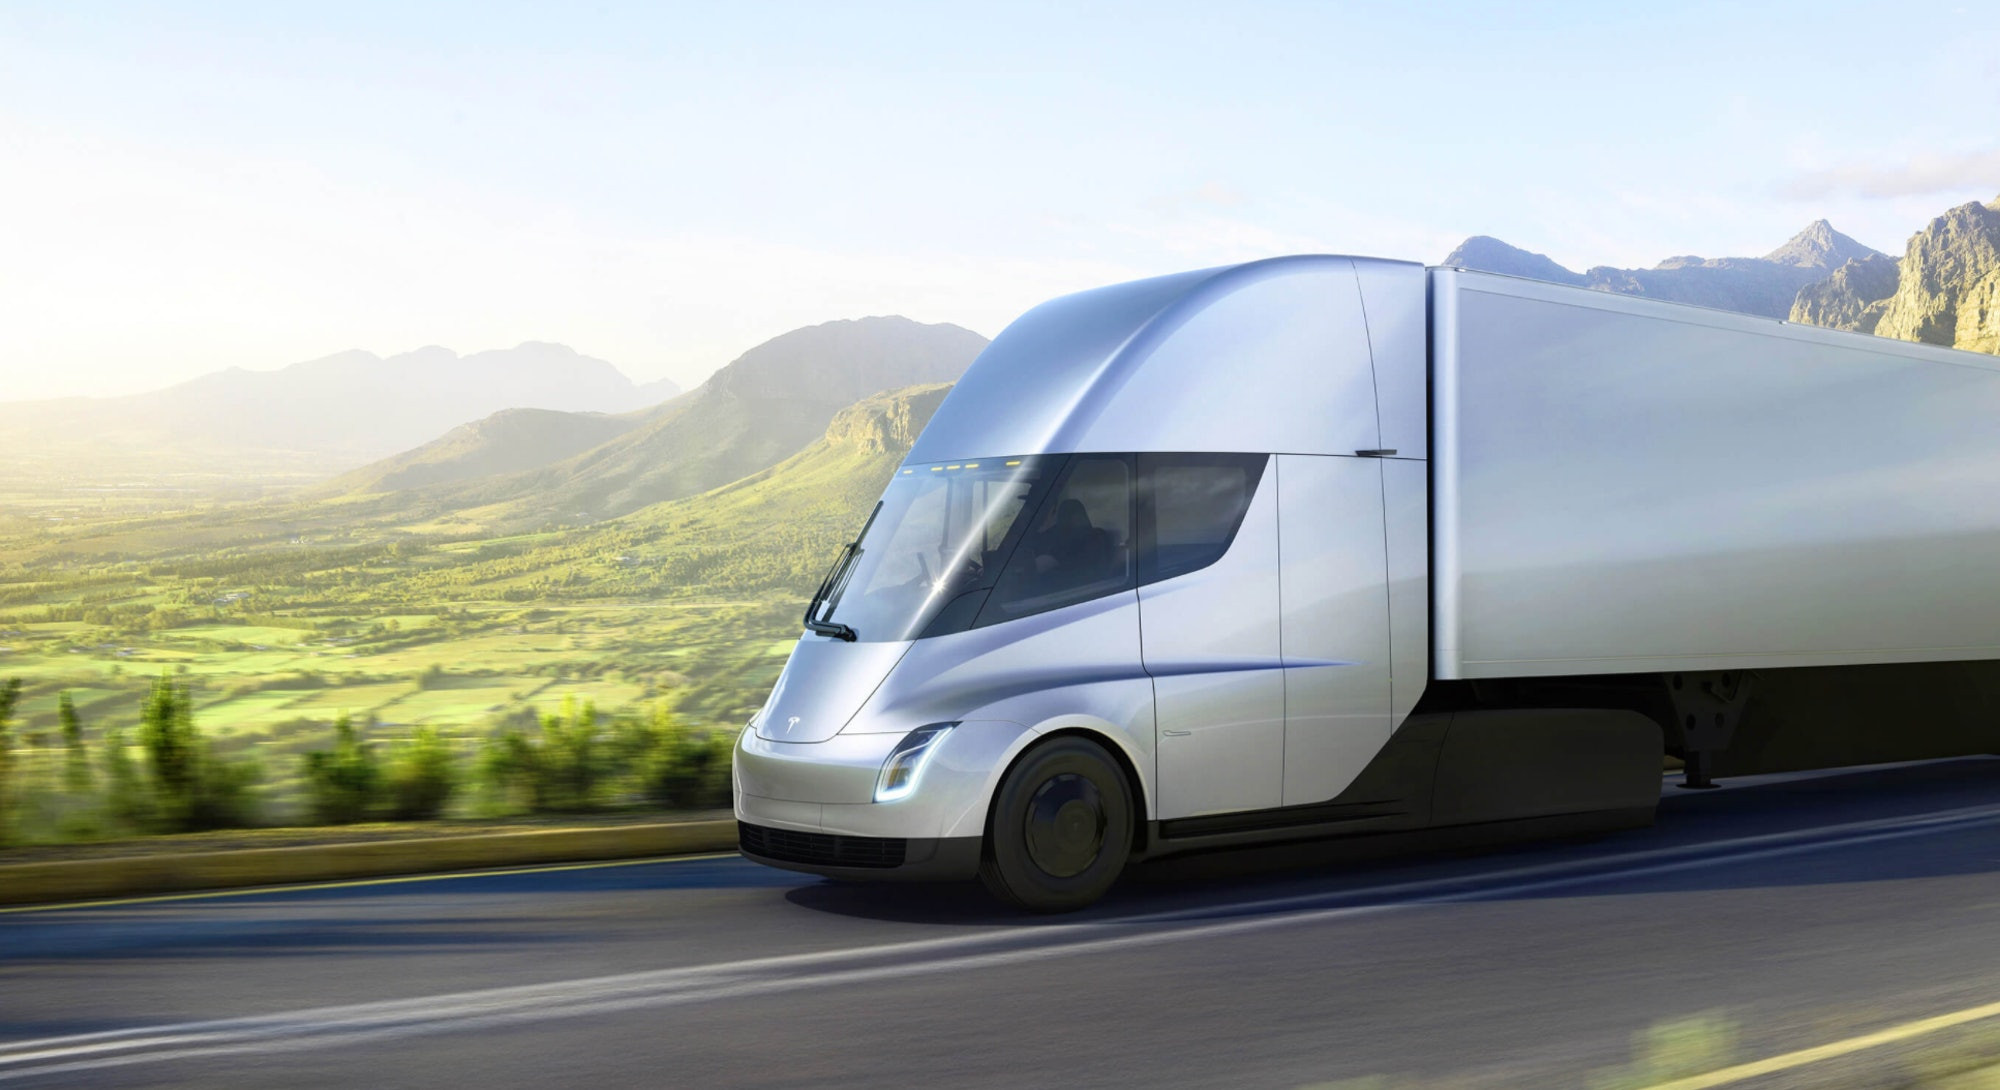 A rendering of the Tesla semi truck.